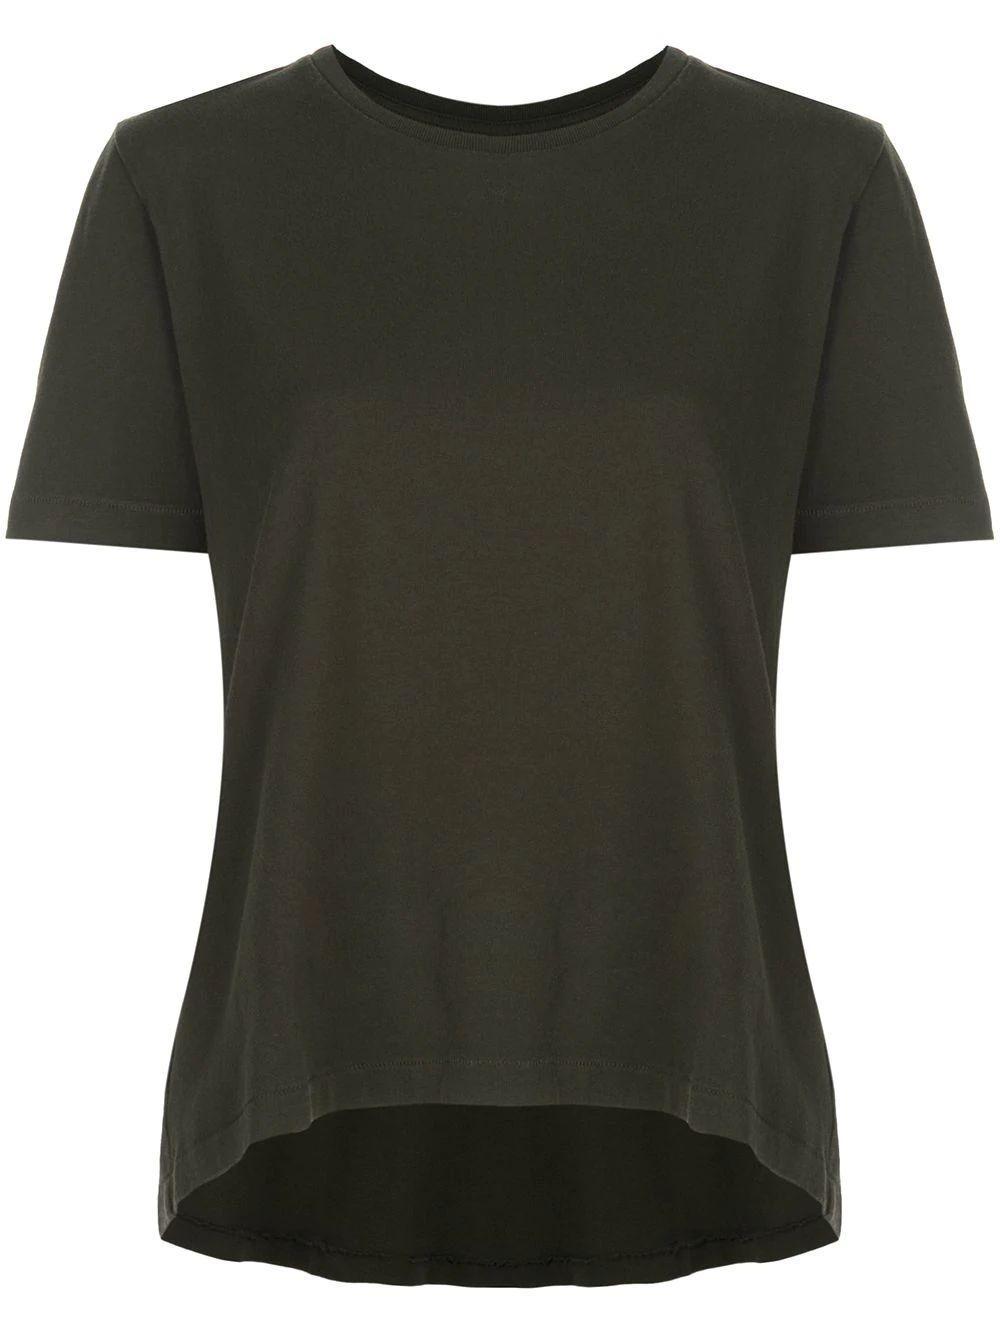 Lenu Back Pleat Short Sleeve Shirt Item # 9145-1034